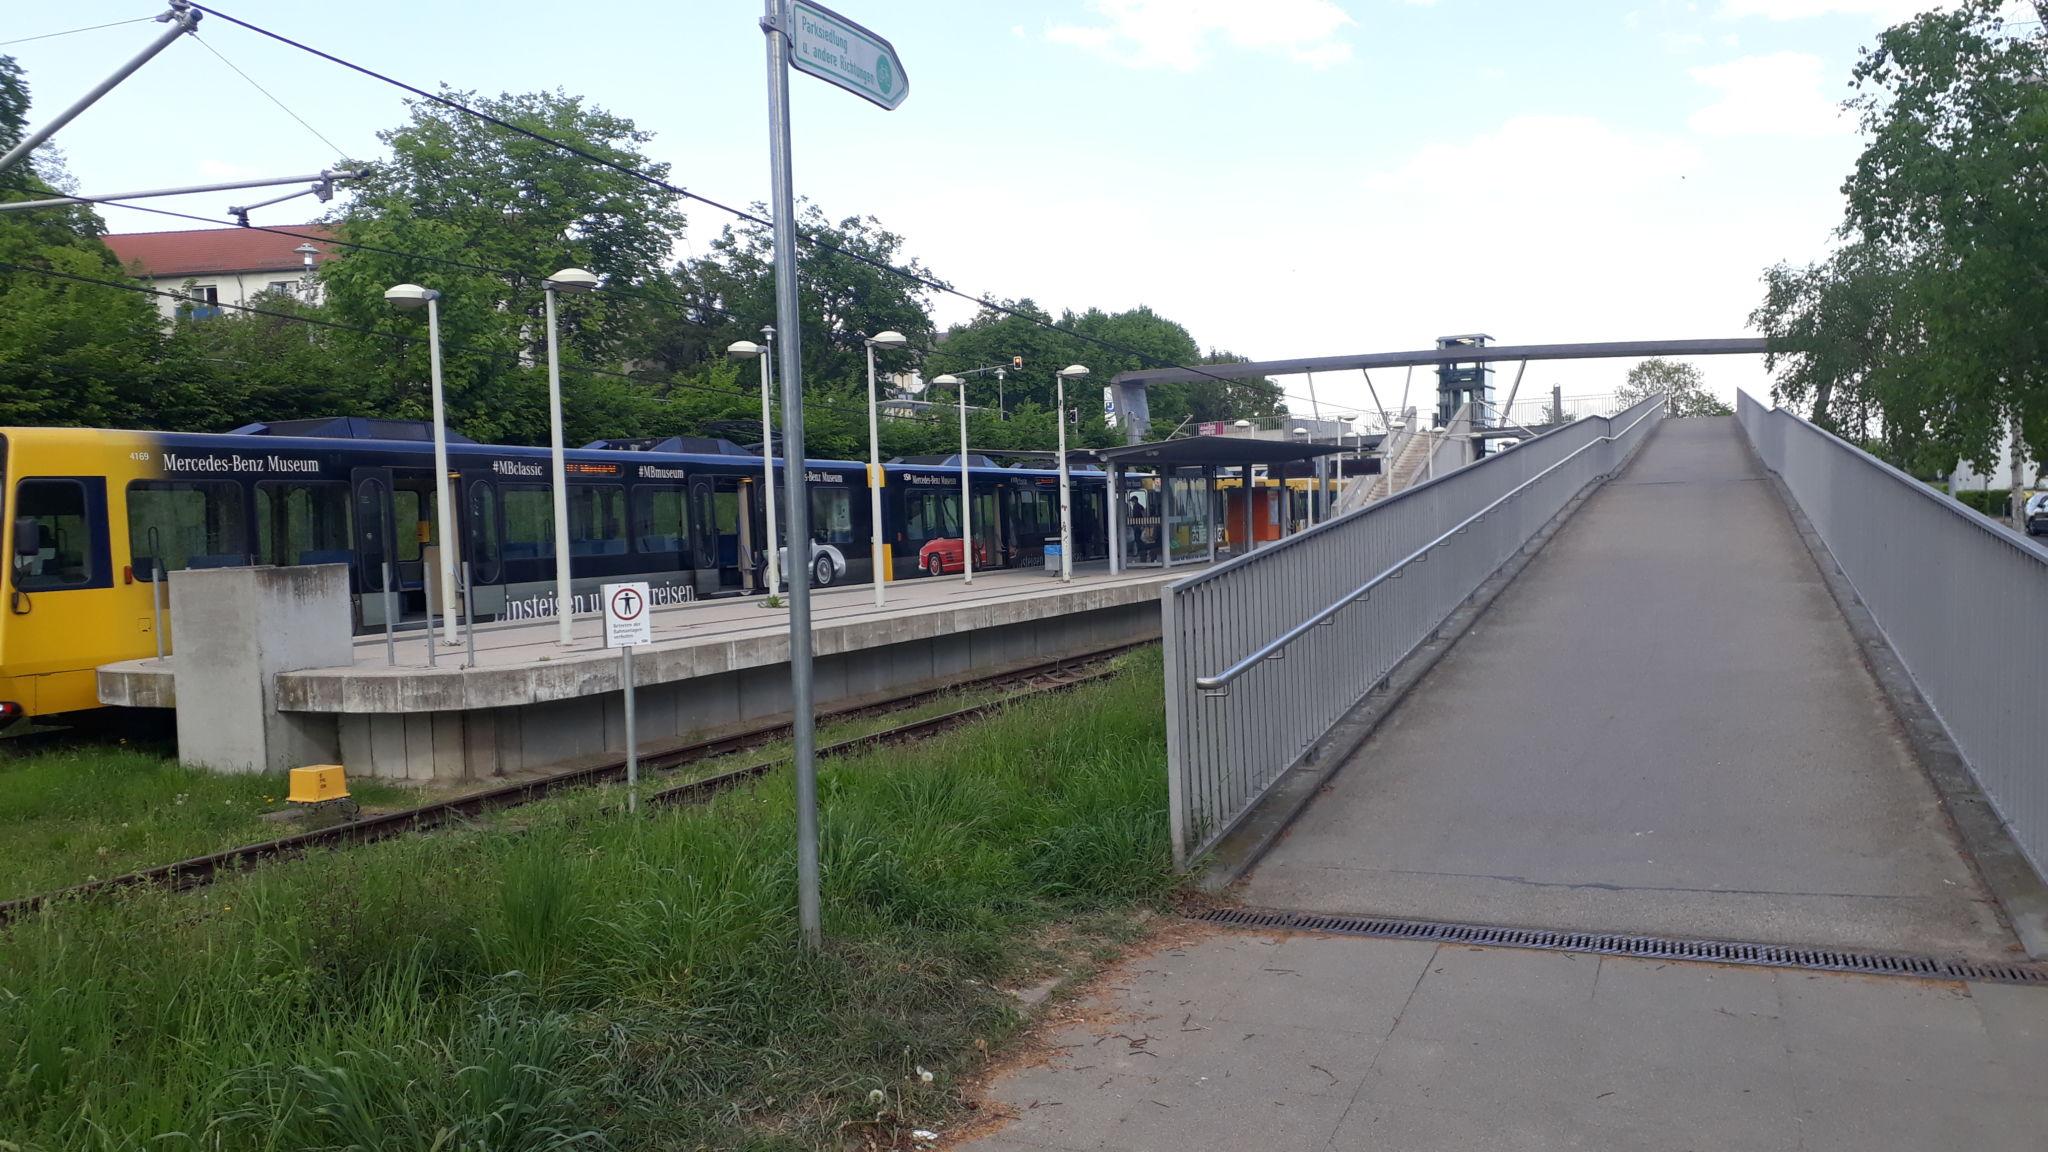 Stadtbahnhaltestelle Parksiedlung U7 / U8, Parksiedlung